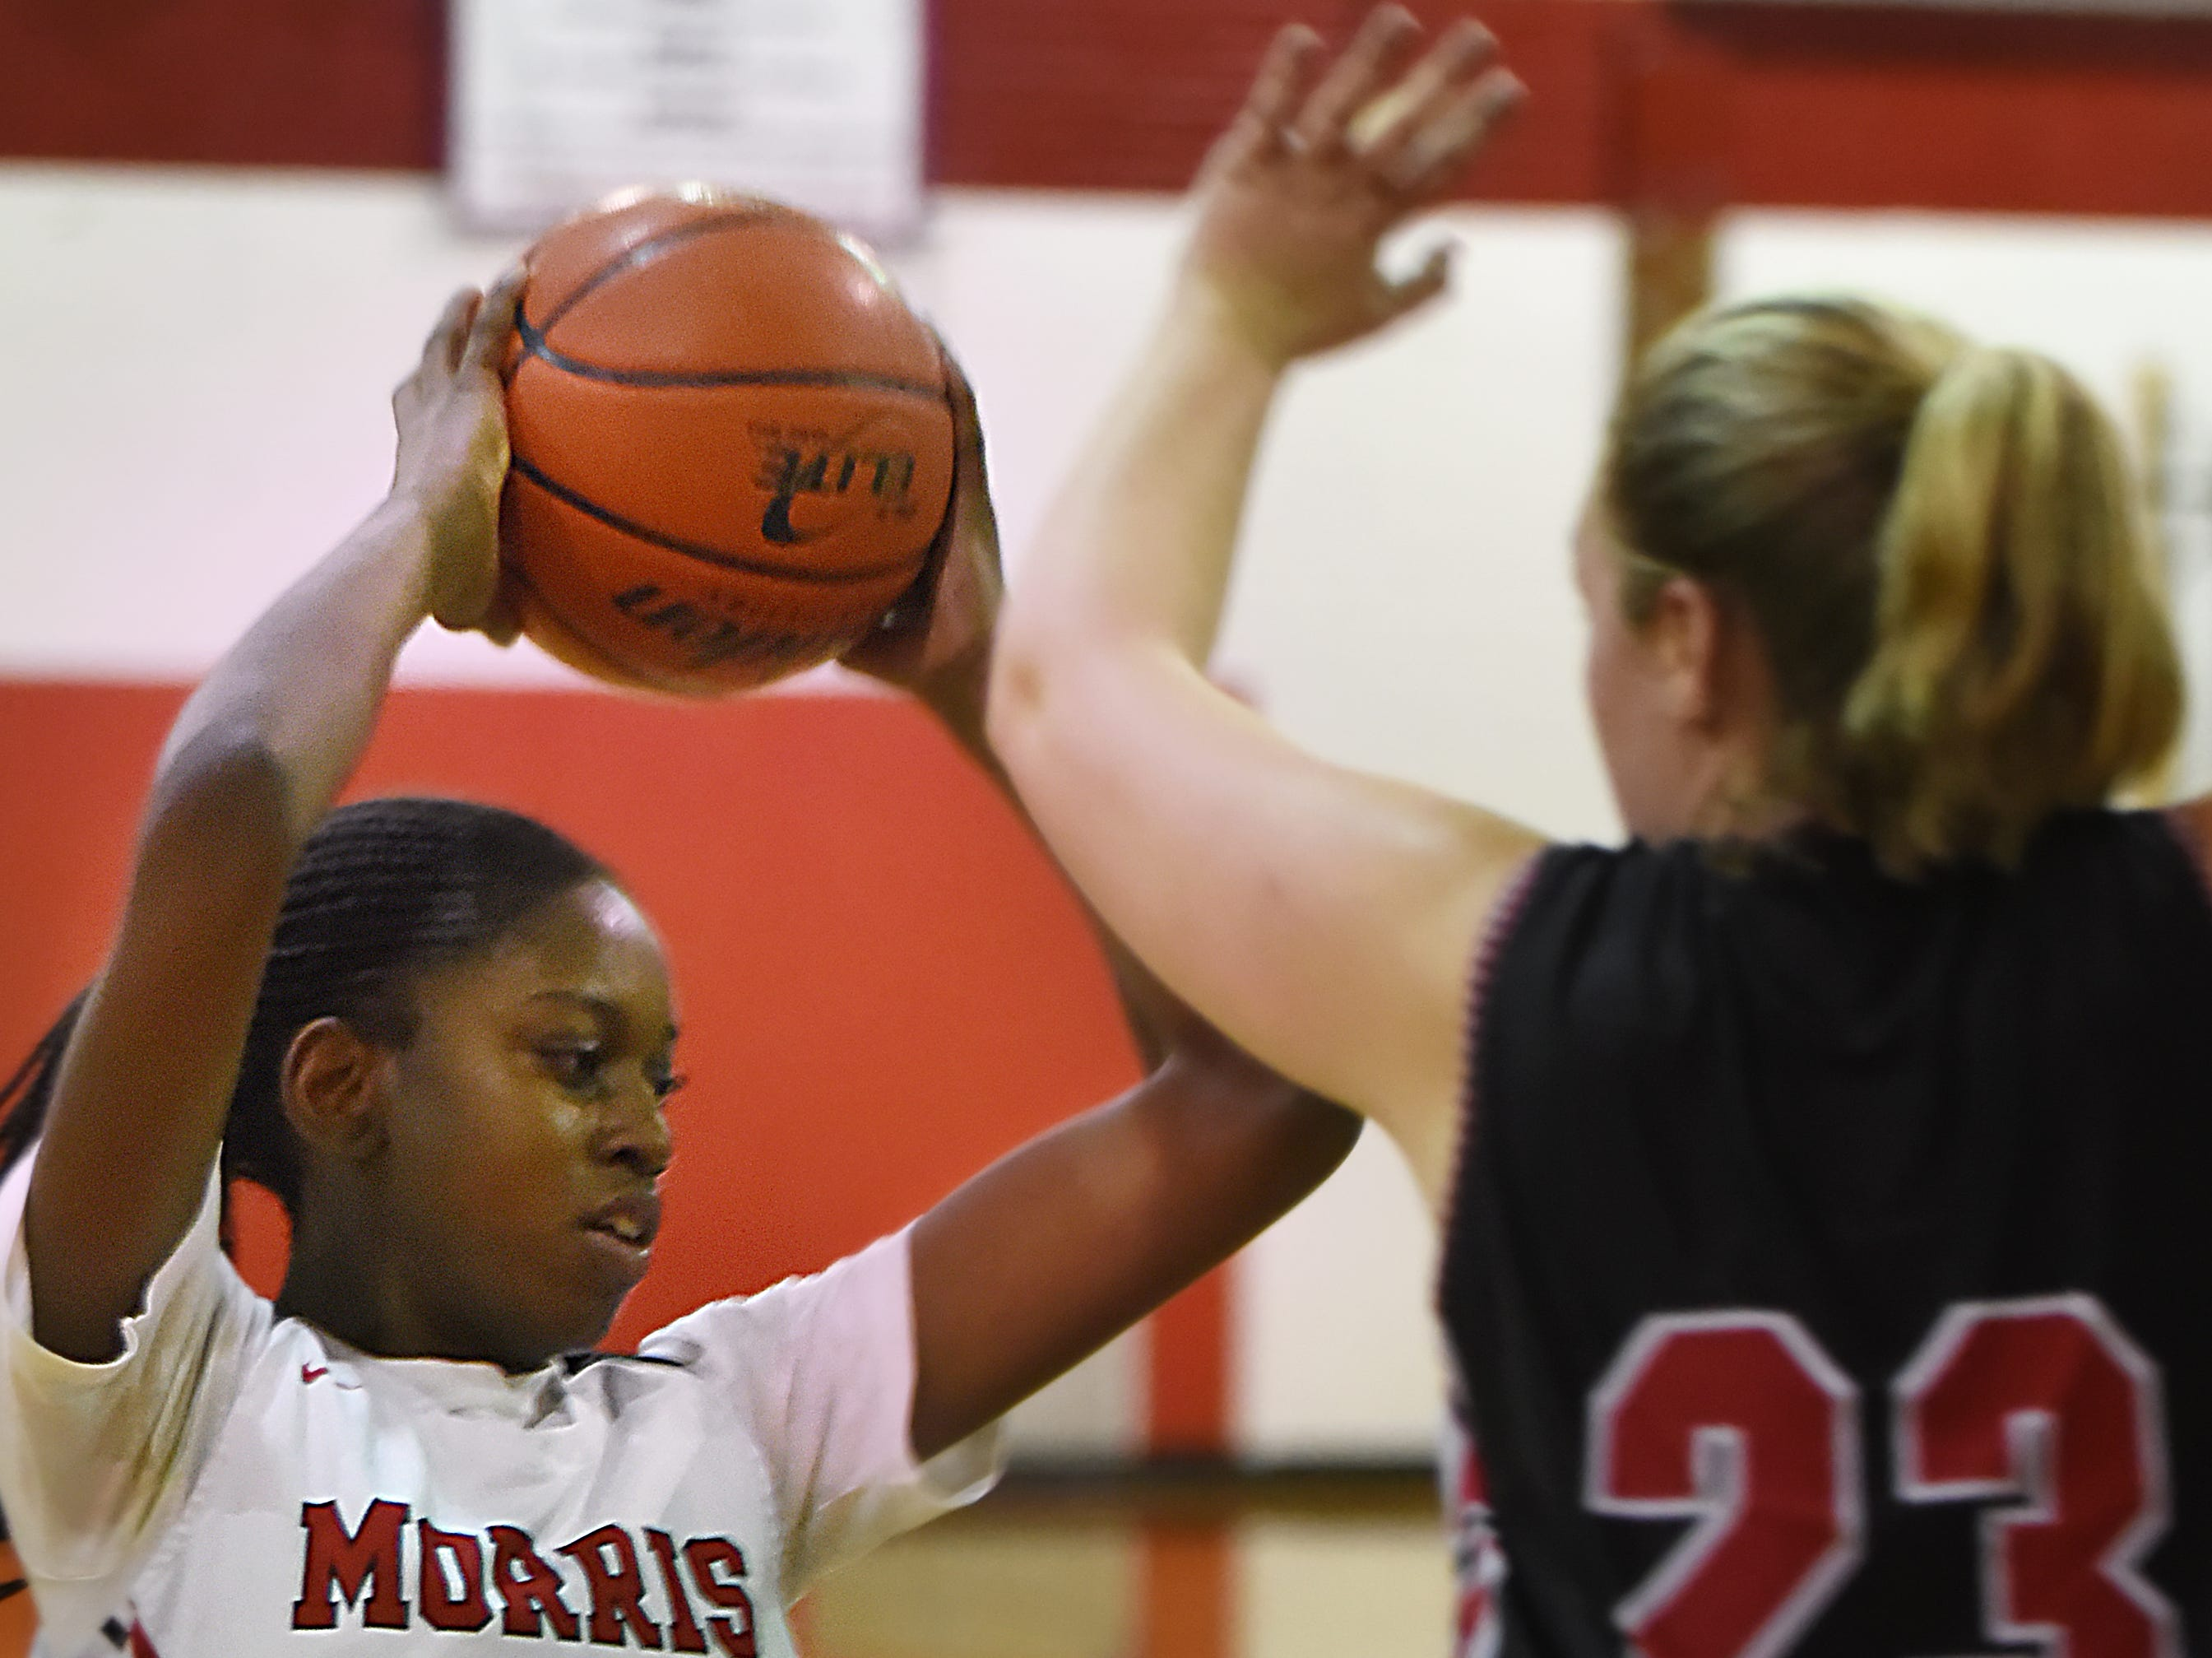 Boonton Vs. Morris Hills girls basketball game at the Morris Hills Holiday Tournament in Rockaway on Friday December 28, 2018. MH#24 Semaya Turner and B#23 Devin Gibbs.